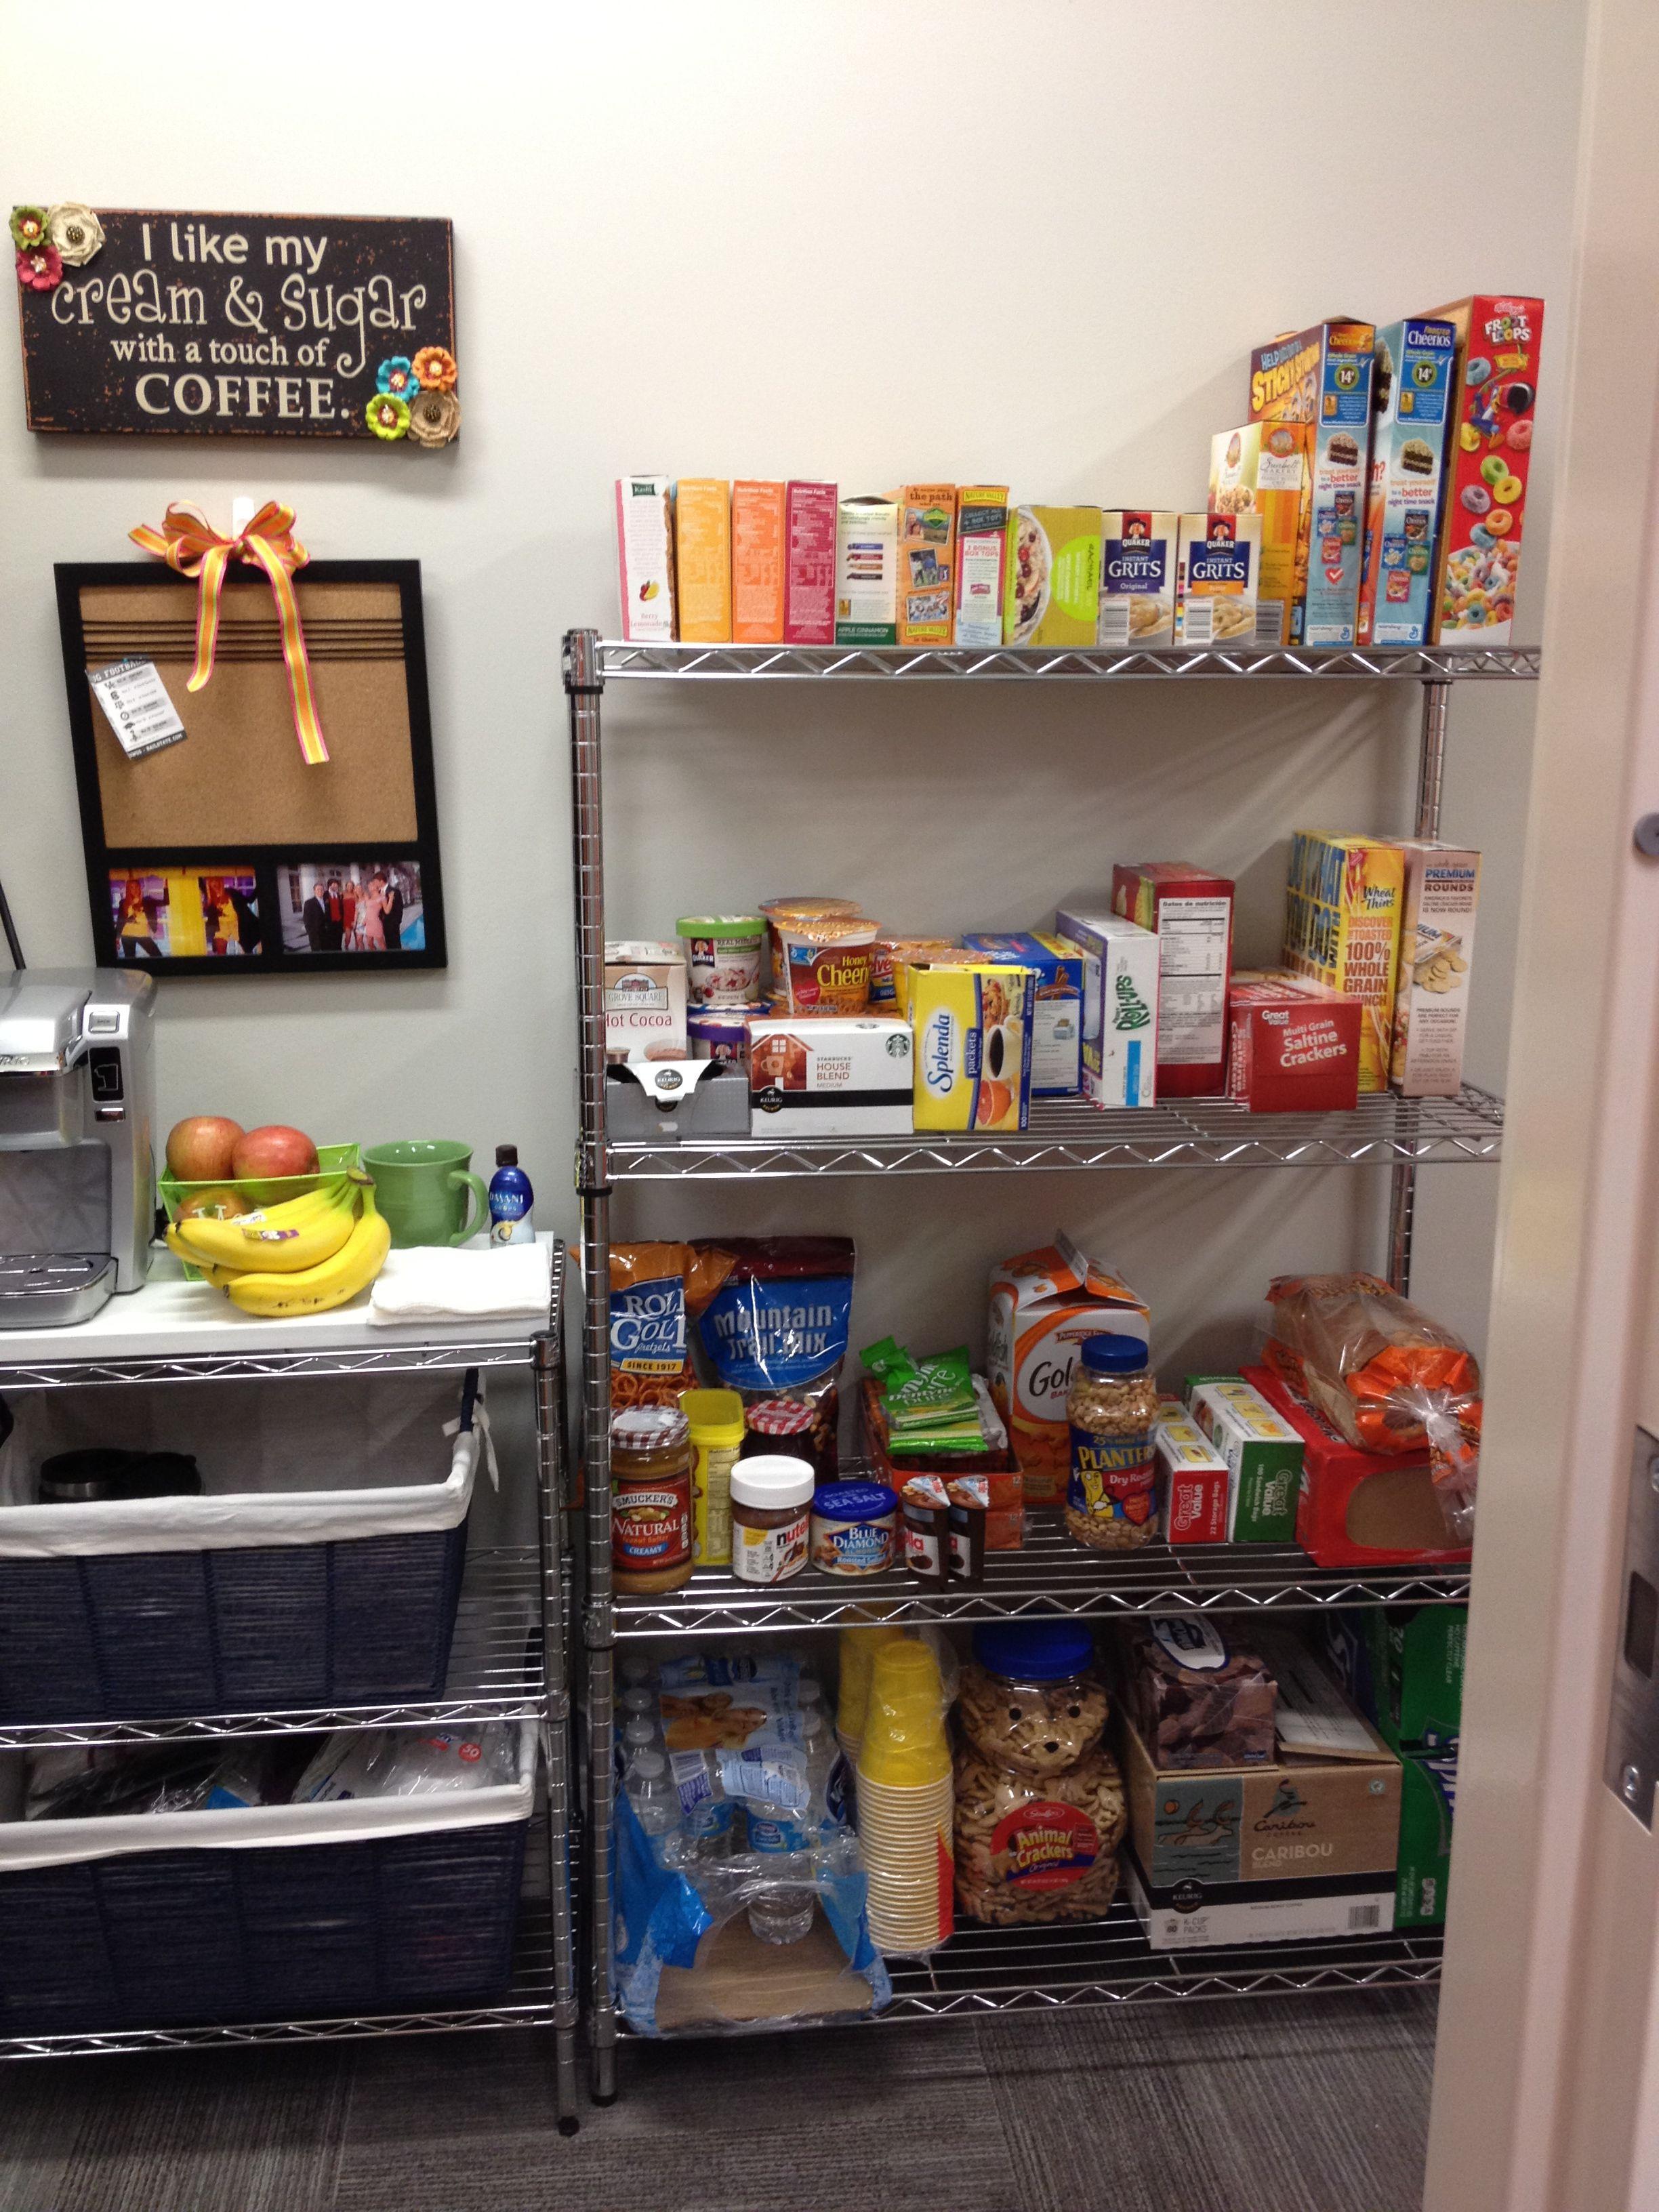 Msu dorm room food storage in shelves aric 39 s room dorm storage dorm room storage dorm - Dorm room storage ideas ...